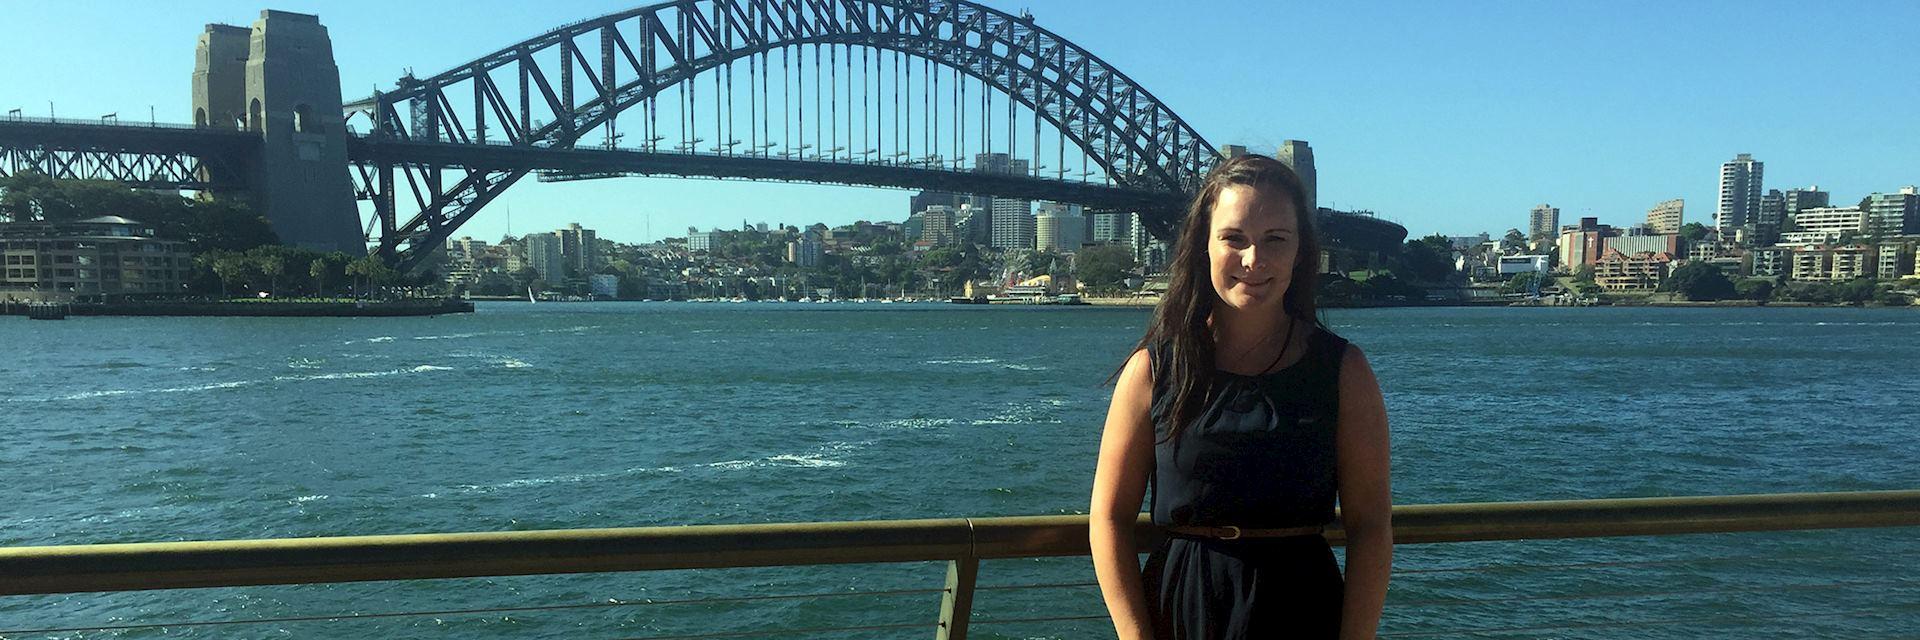 Pippa in Sydney, Australia